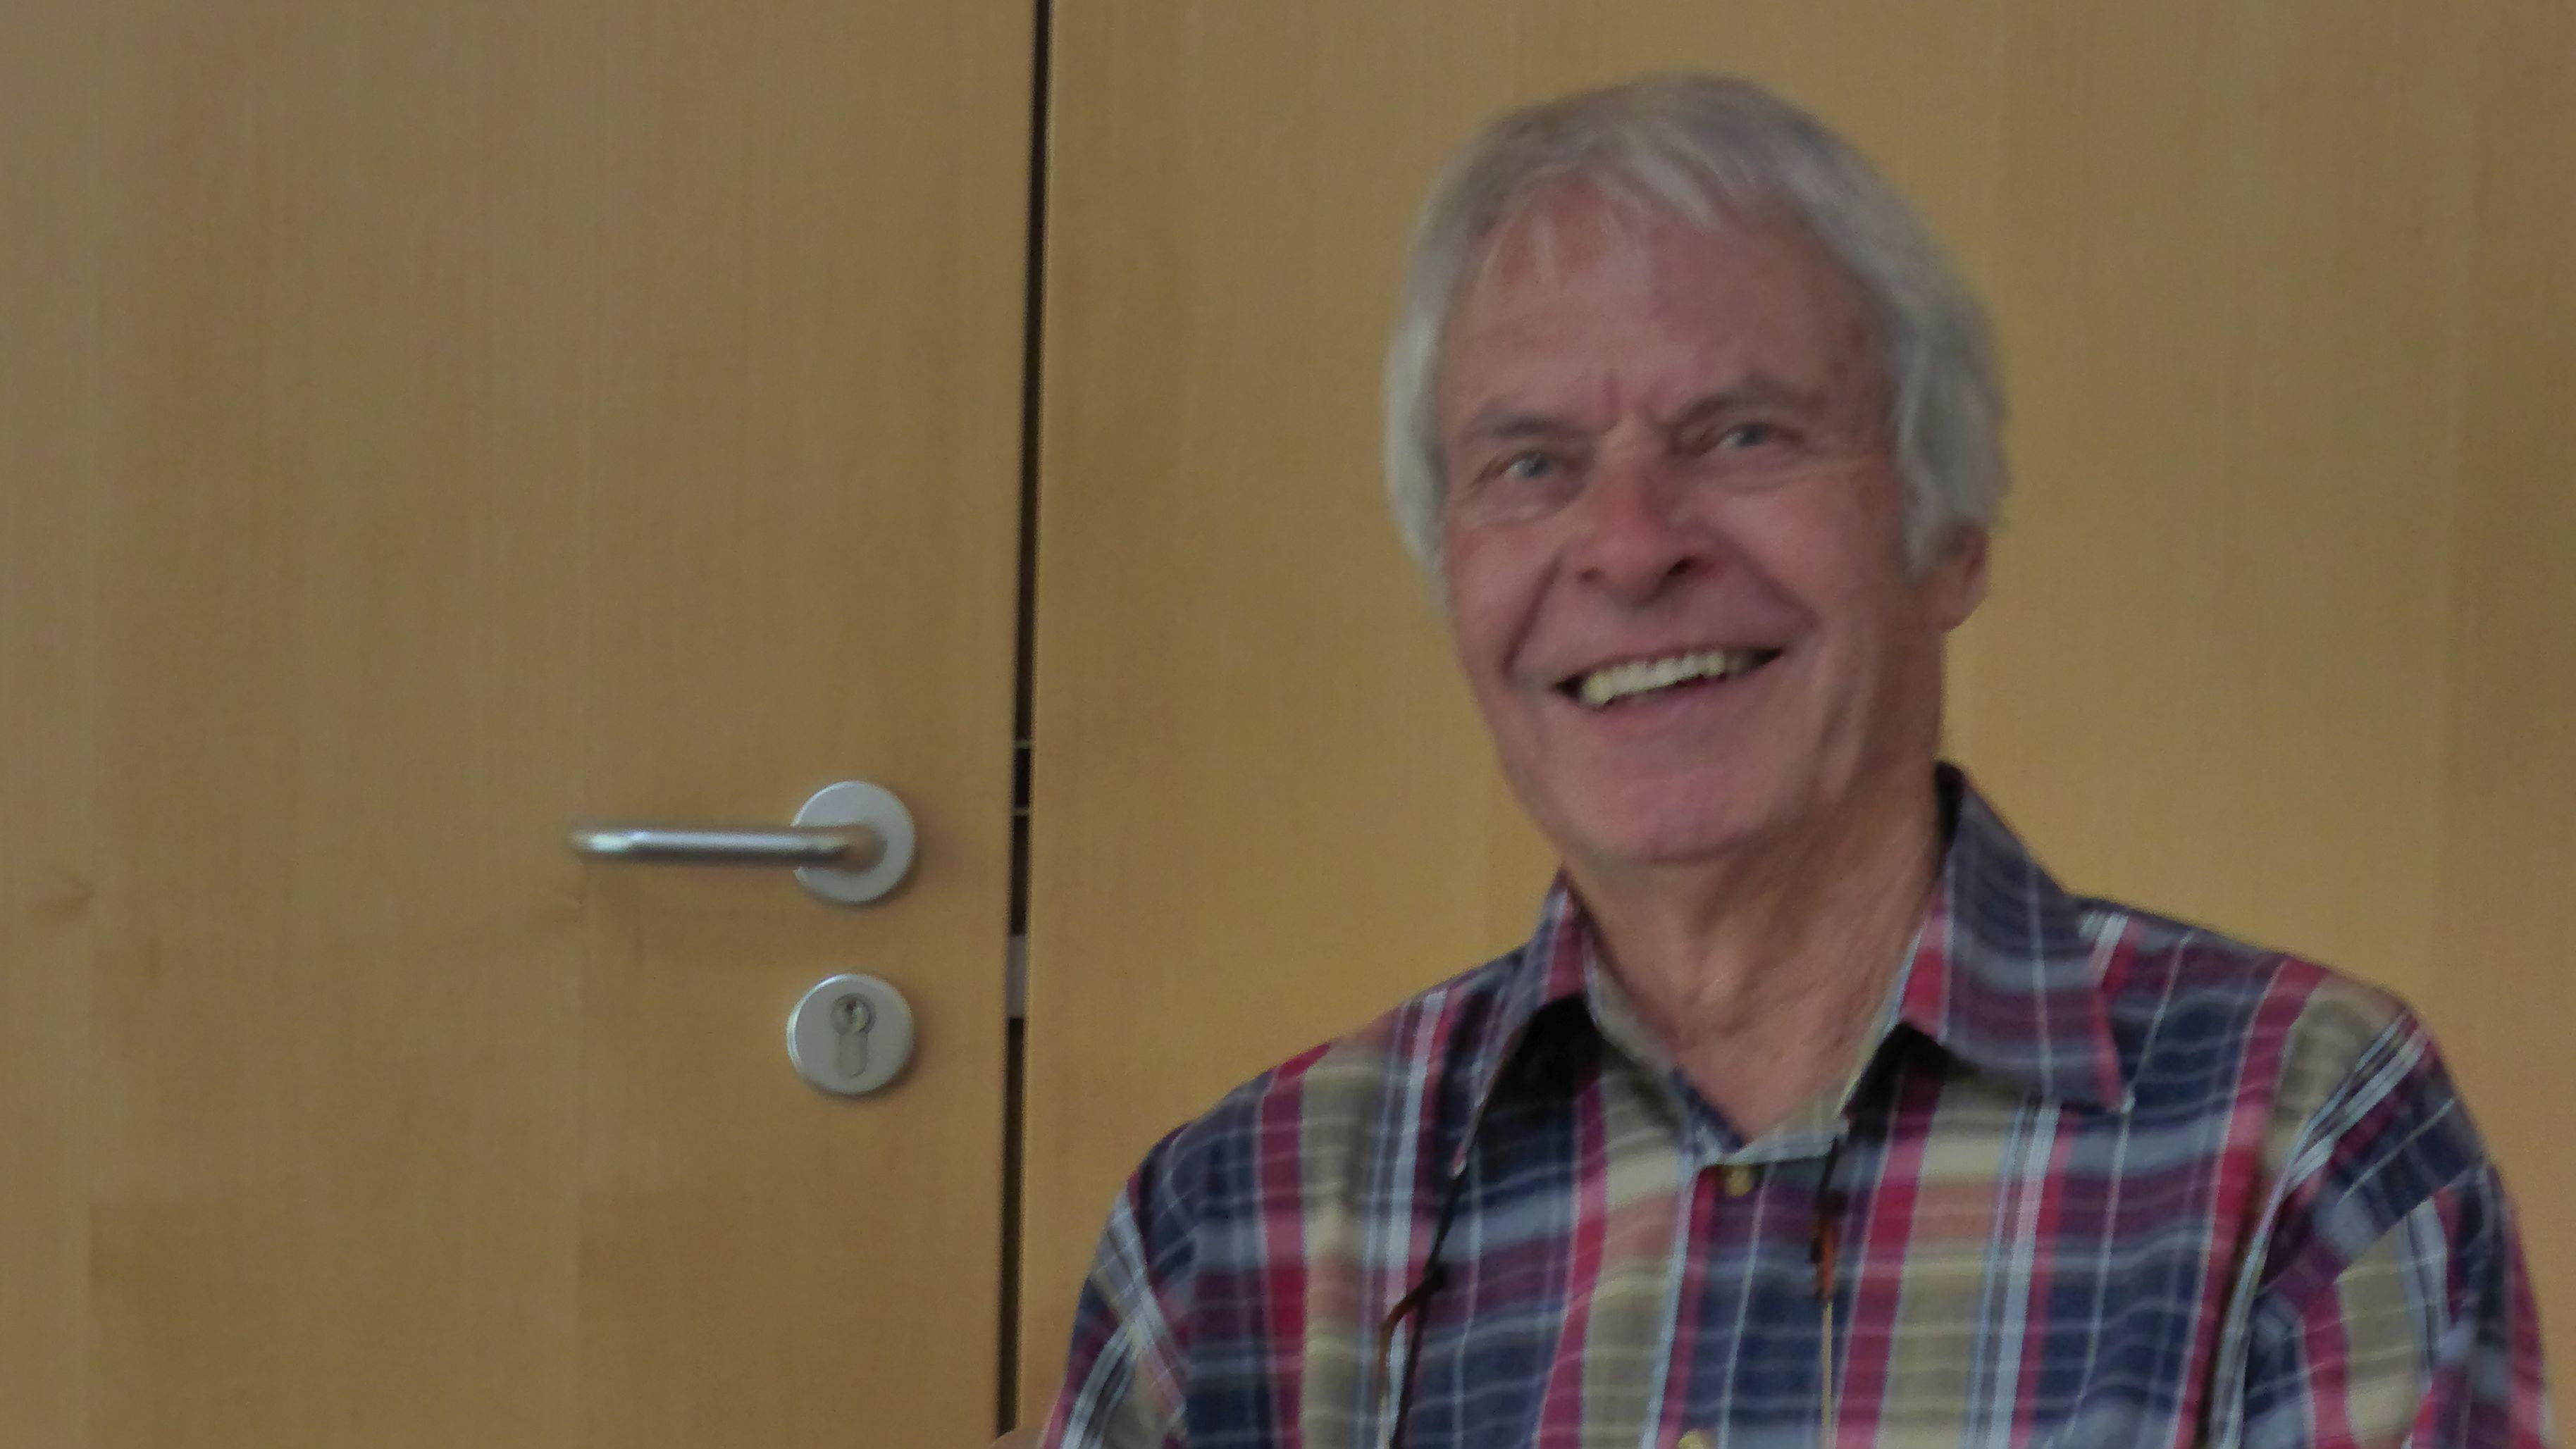 Der vermisste 77- jährige Michael Johannes Bergmann aus Weiden